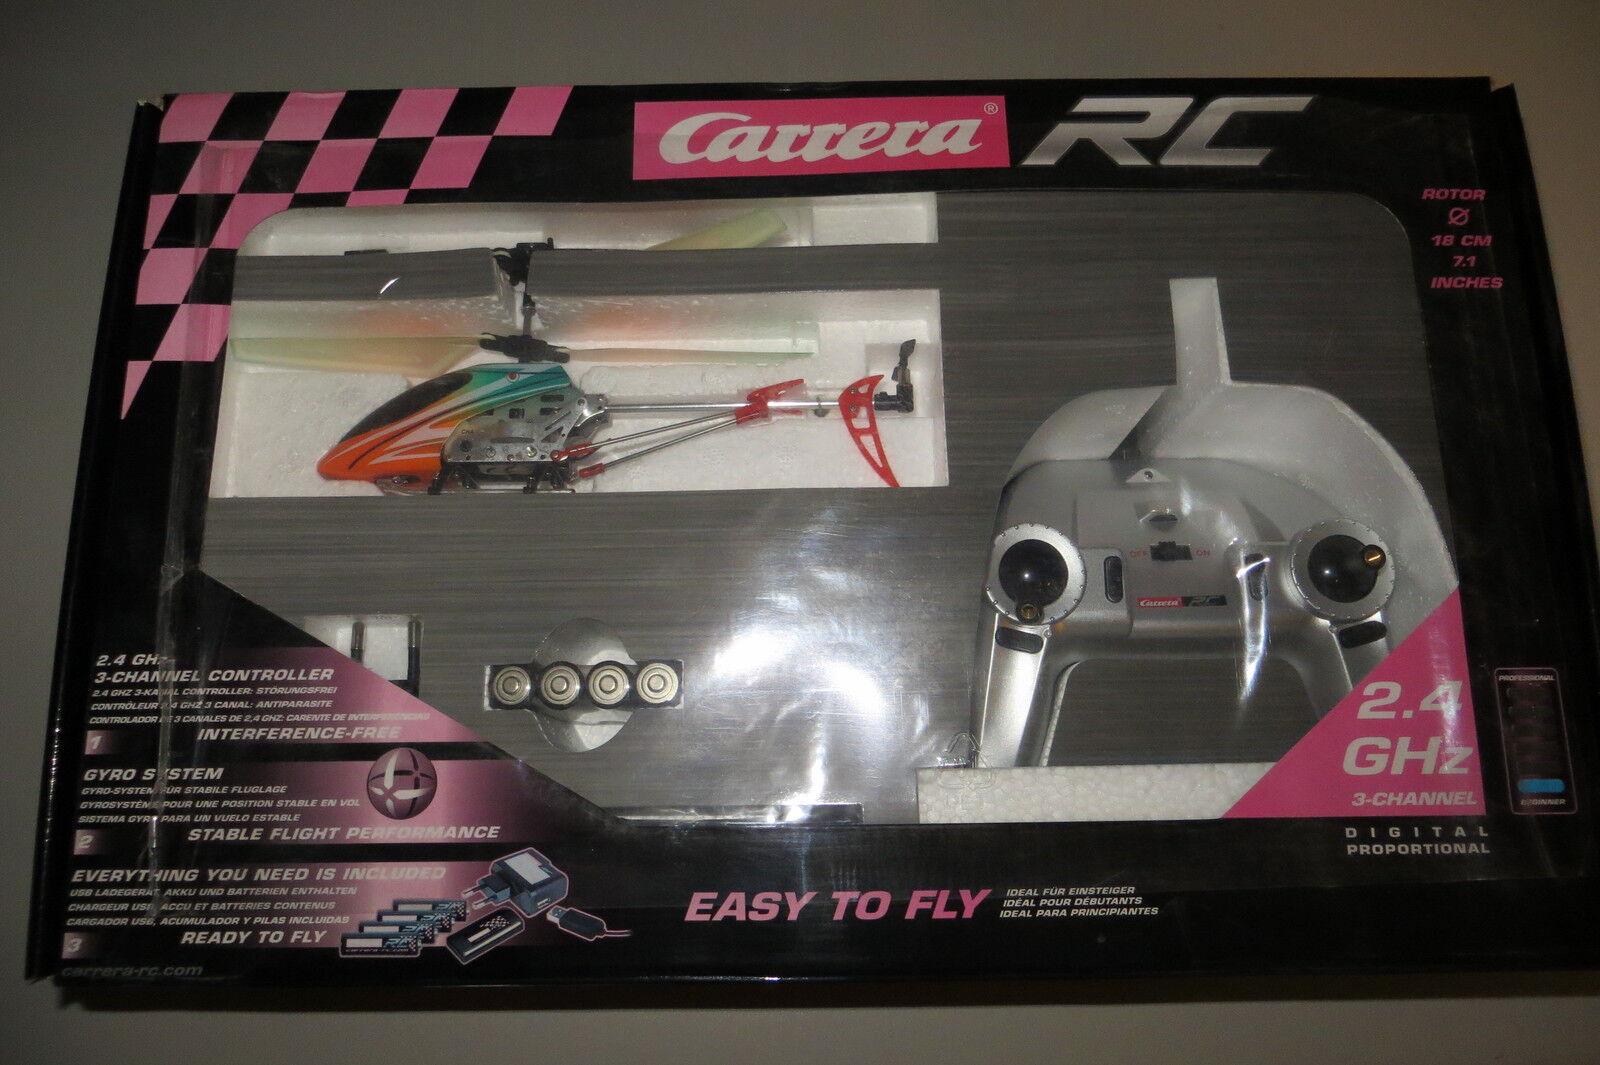 Carrera RC 5001005 Orange Sply Helikopter - Digital Proportional 2,4GHz